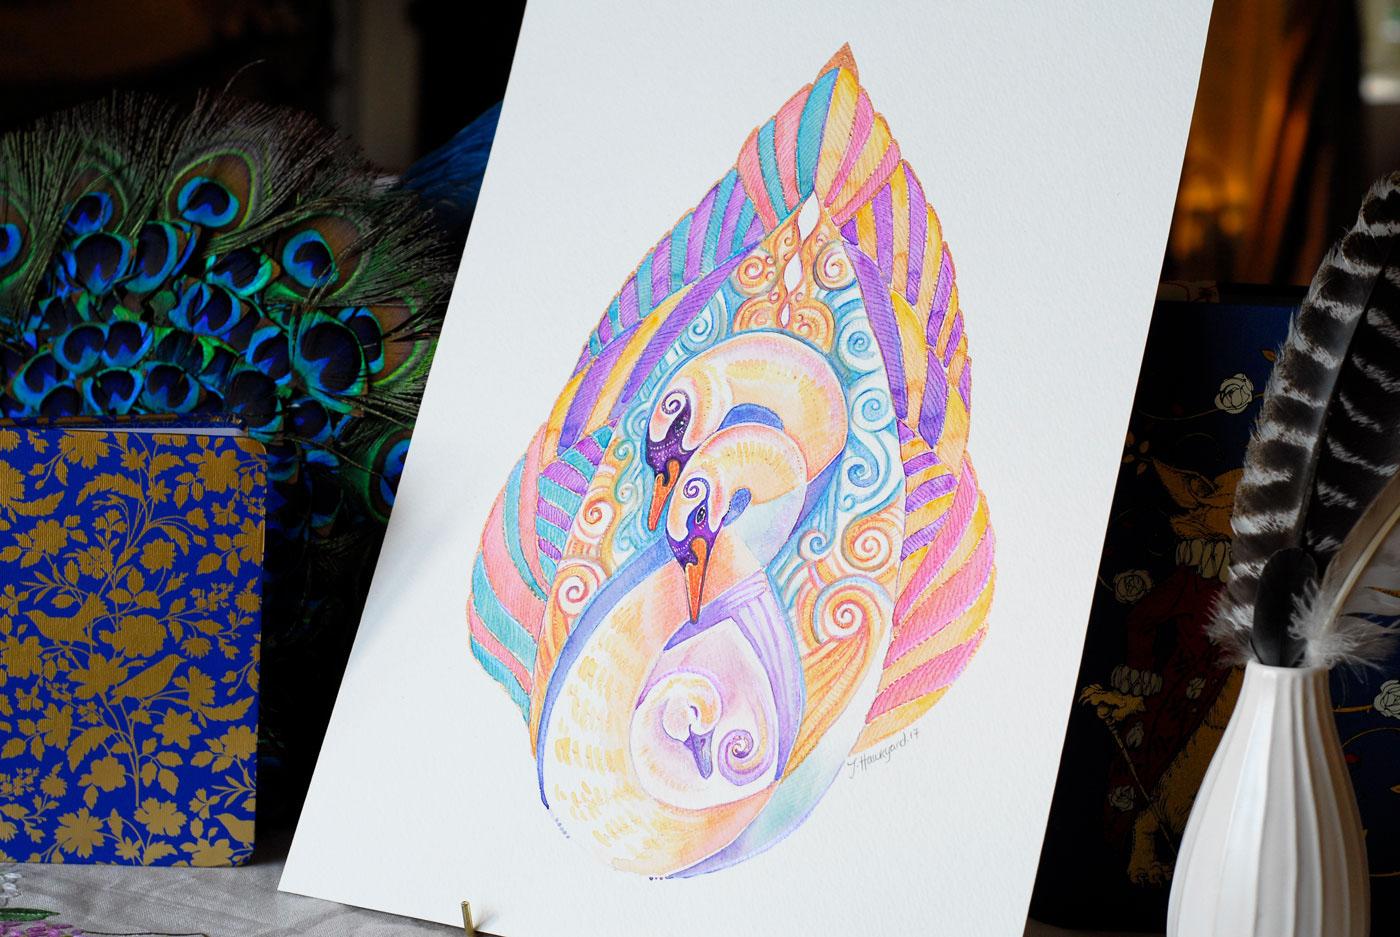 Full view photo of Swan Totem by Jennifer Hawkyard